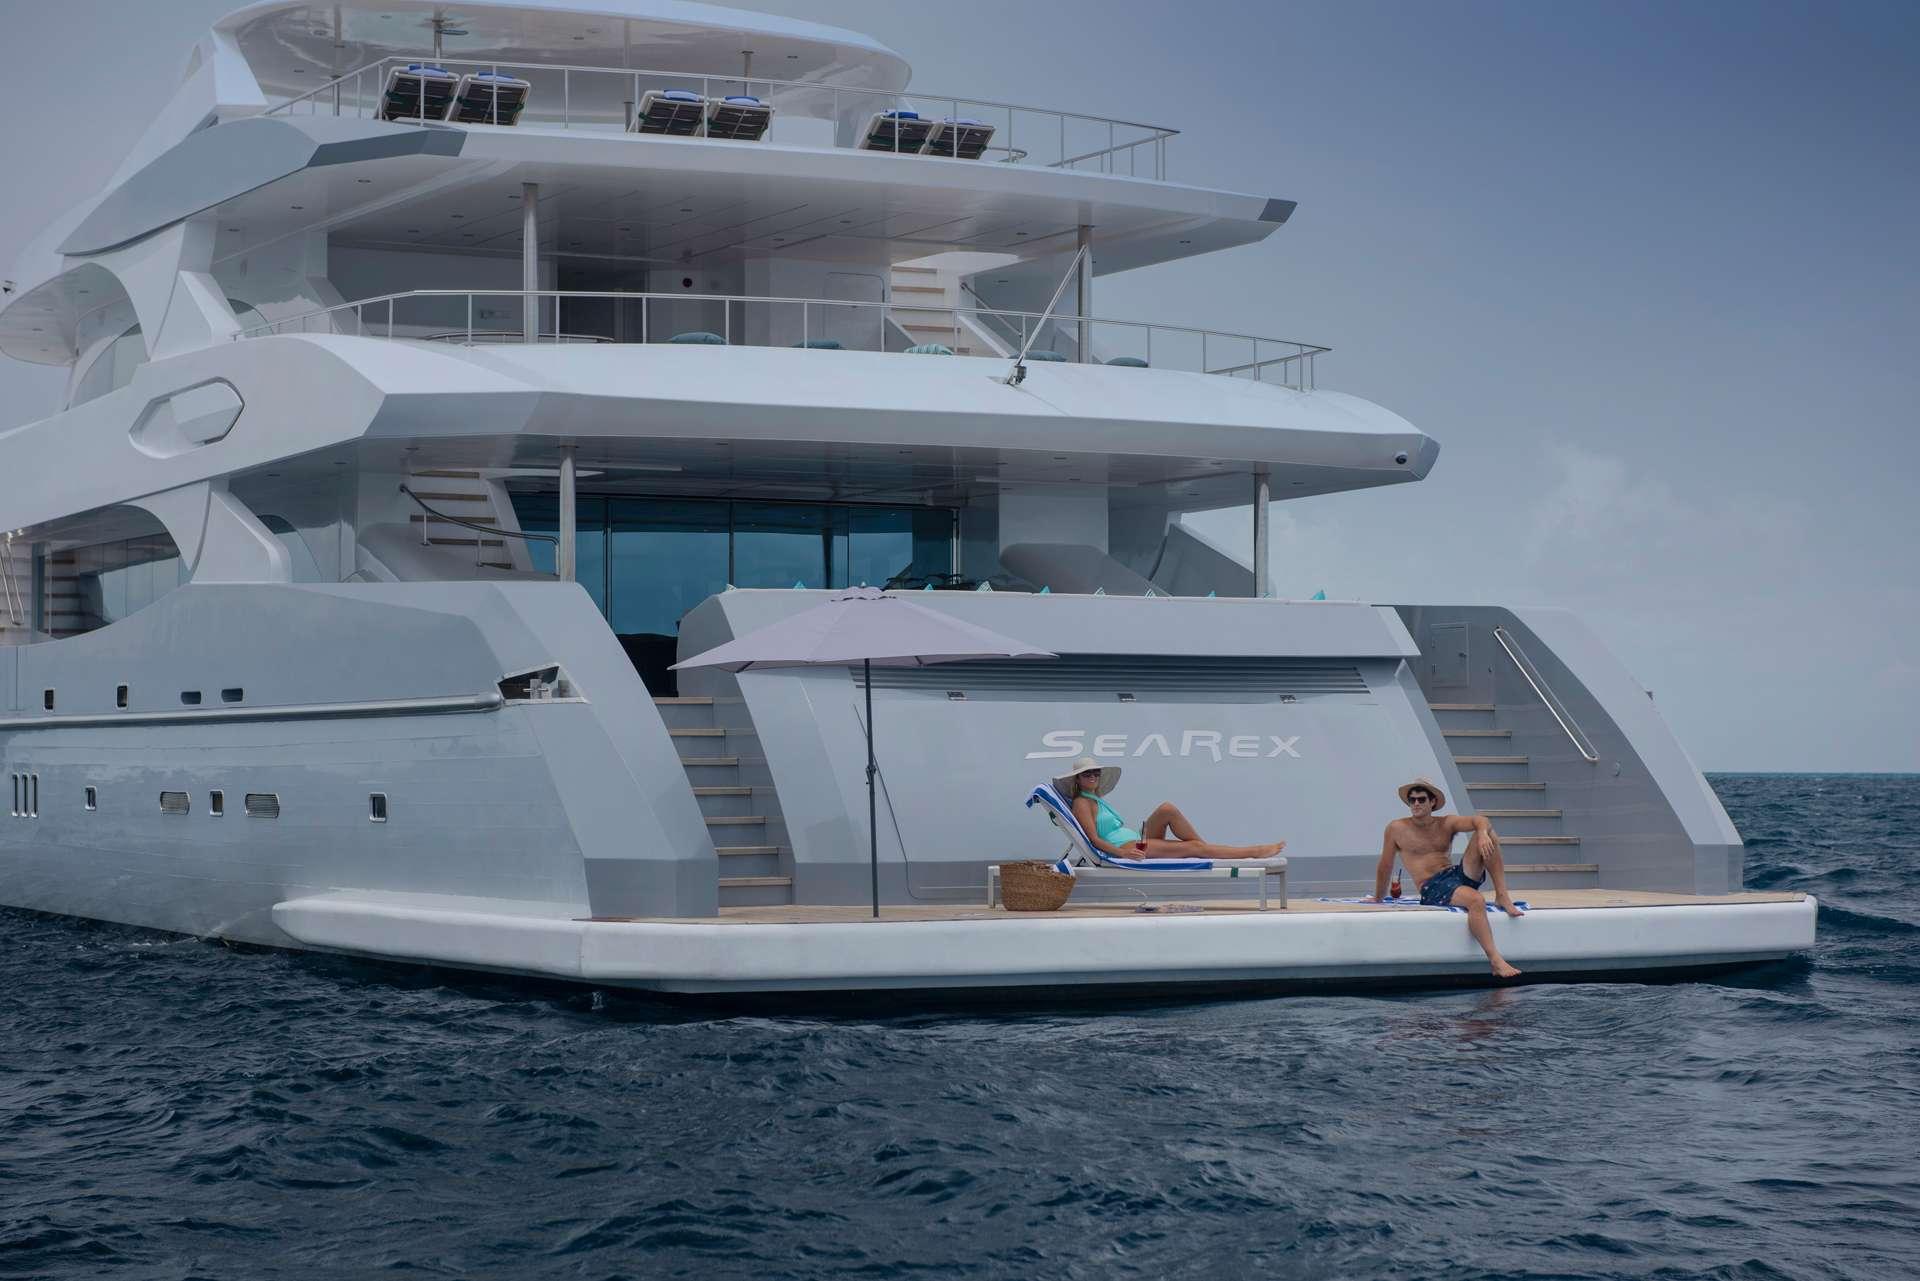 Image of SEAREX yacht #18